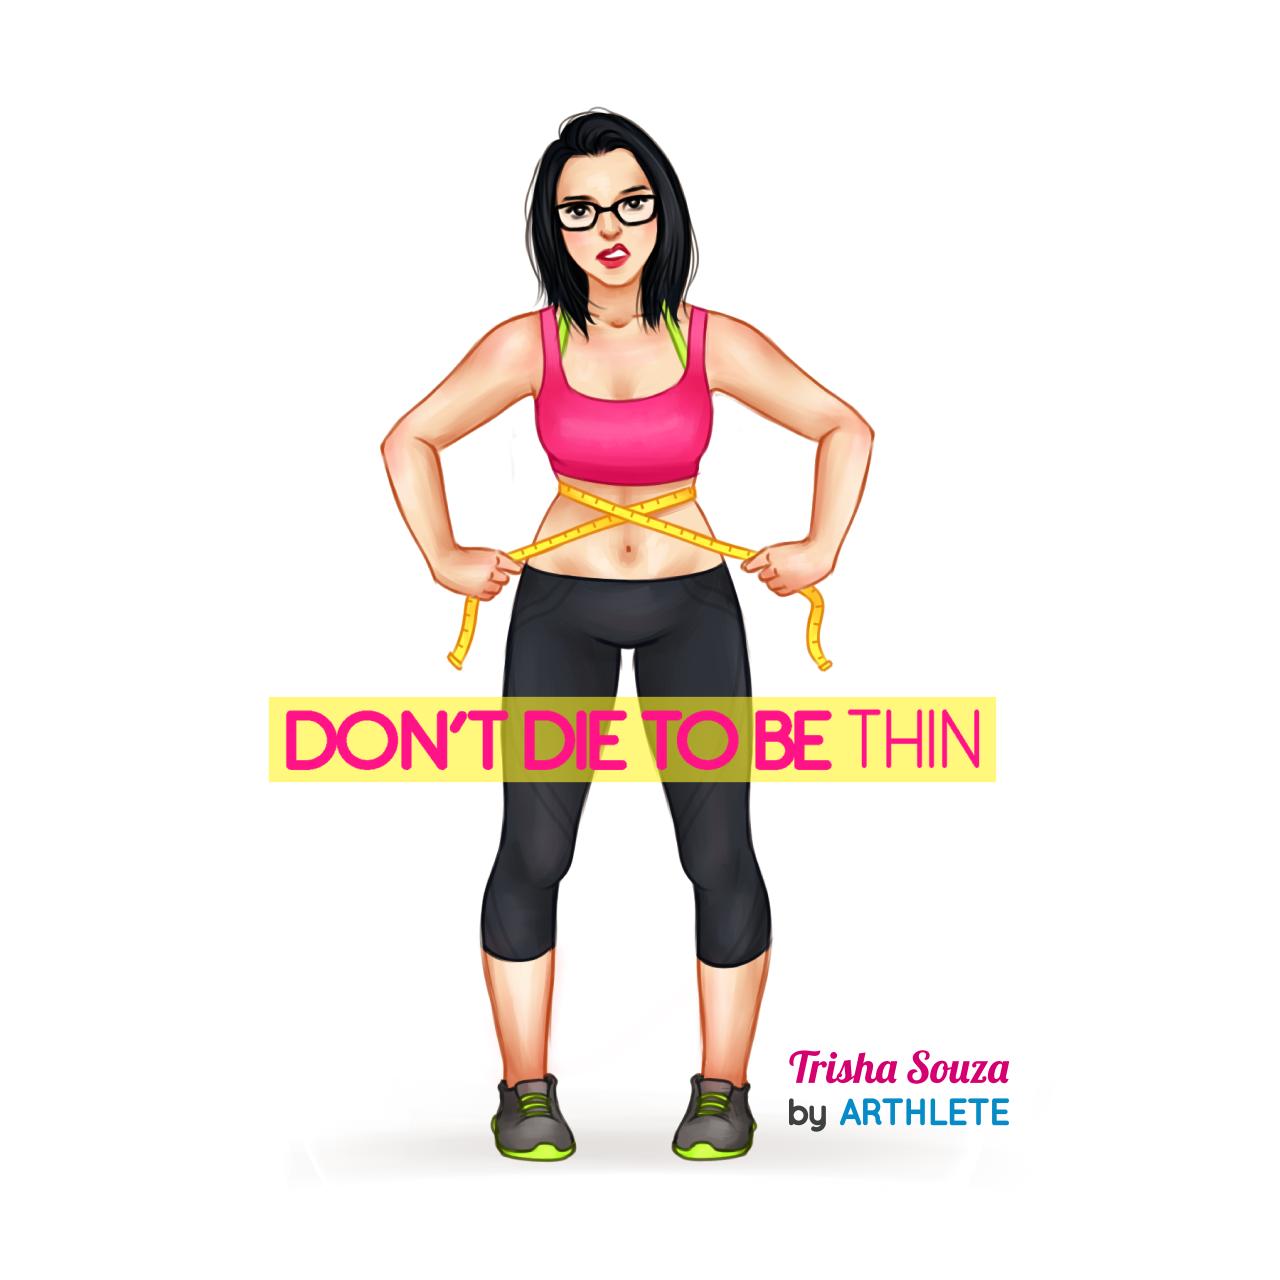 mensagens inspiracionais dieta 8 - grandes mulheres